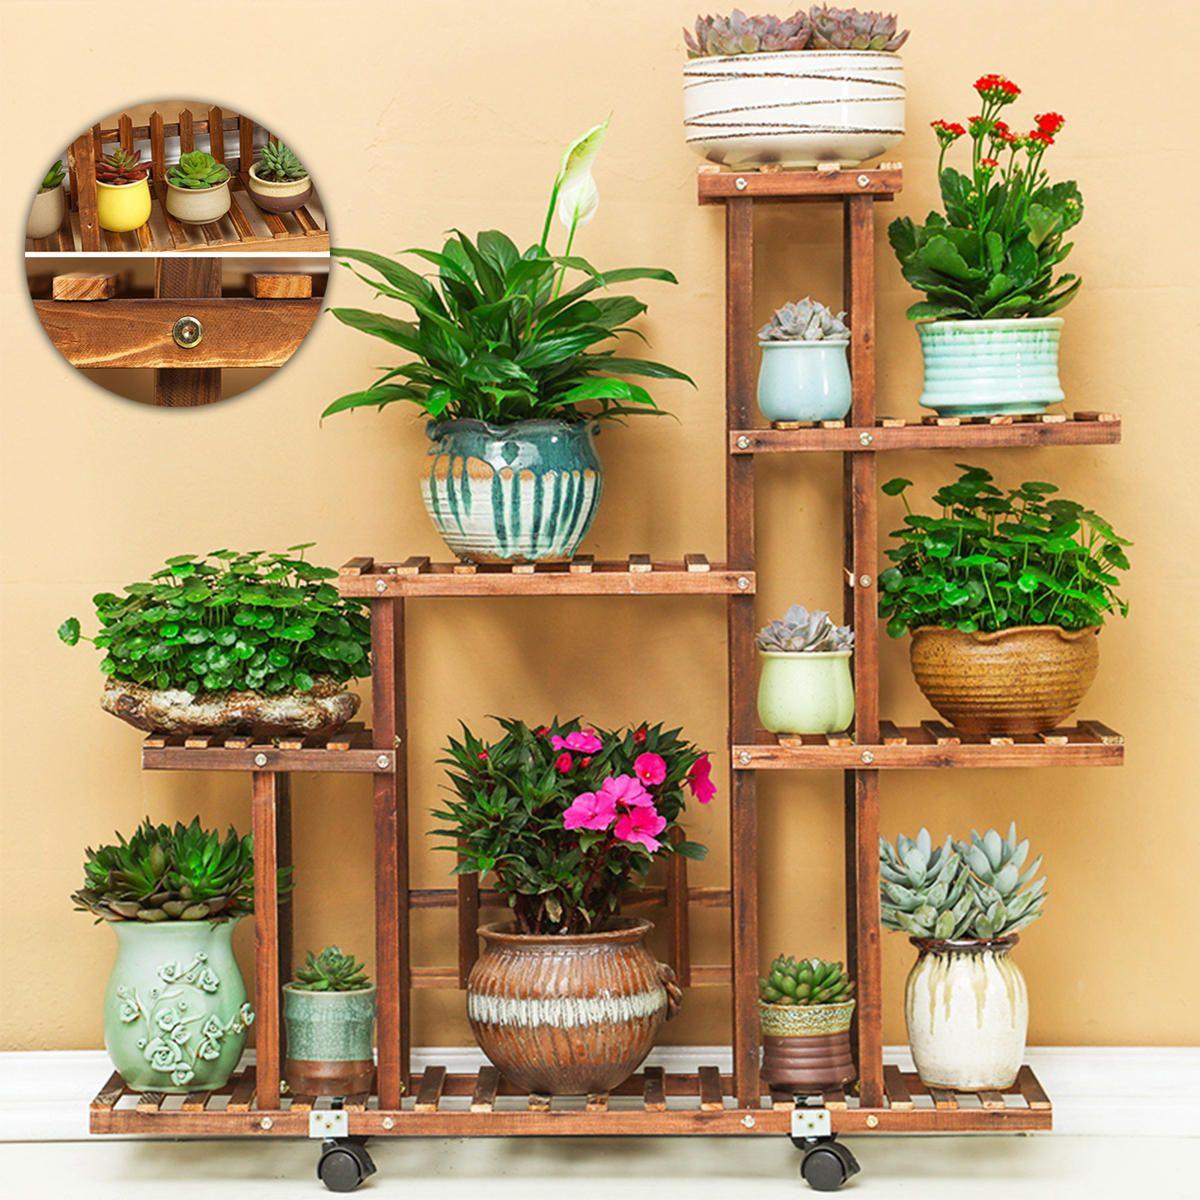 IFE US$99.99 5 Tier Fir Wood Wooden Plant Flower Display Stand Shelf Rack Holder & Wheels